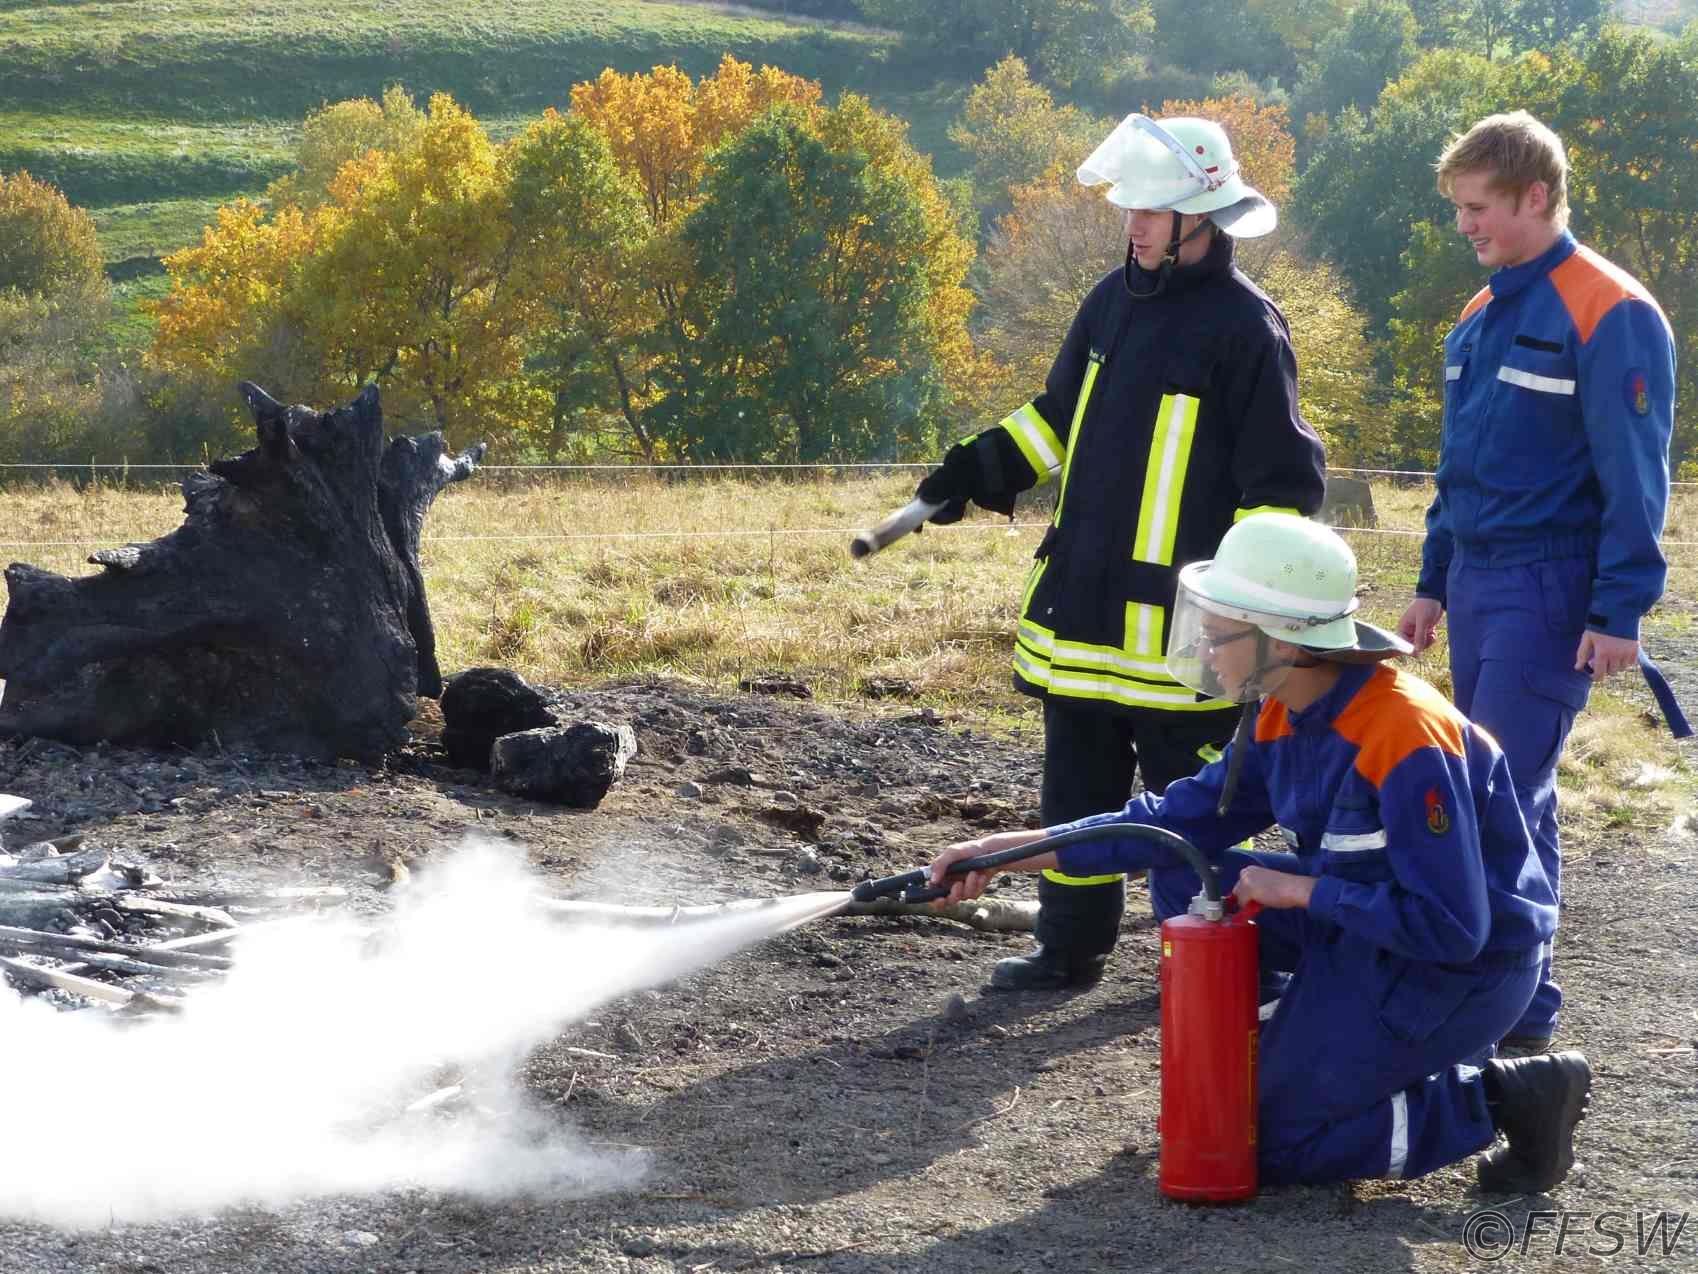 Feuerlöscherausbildung